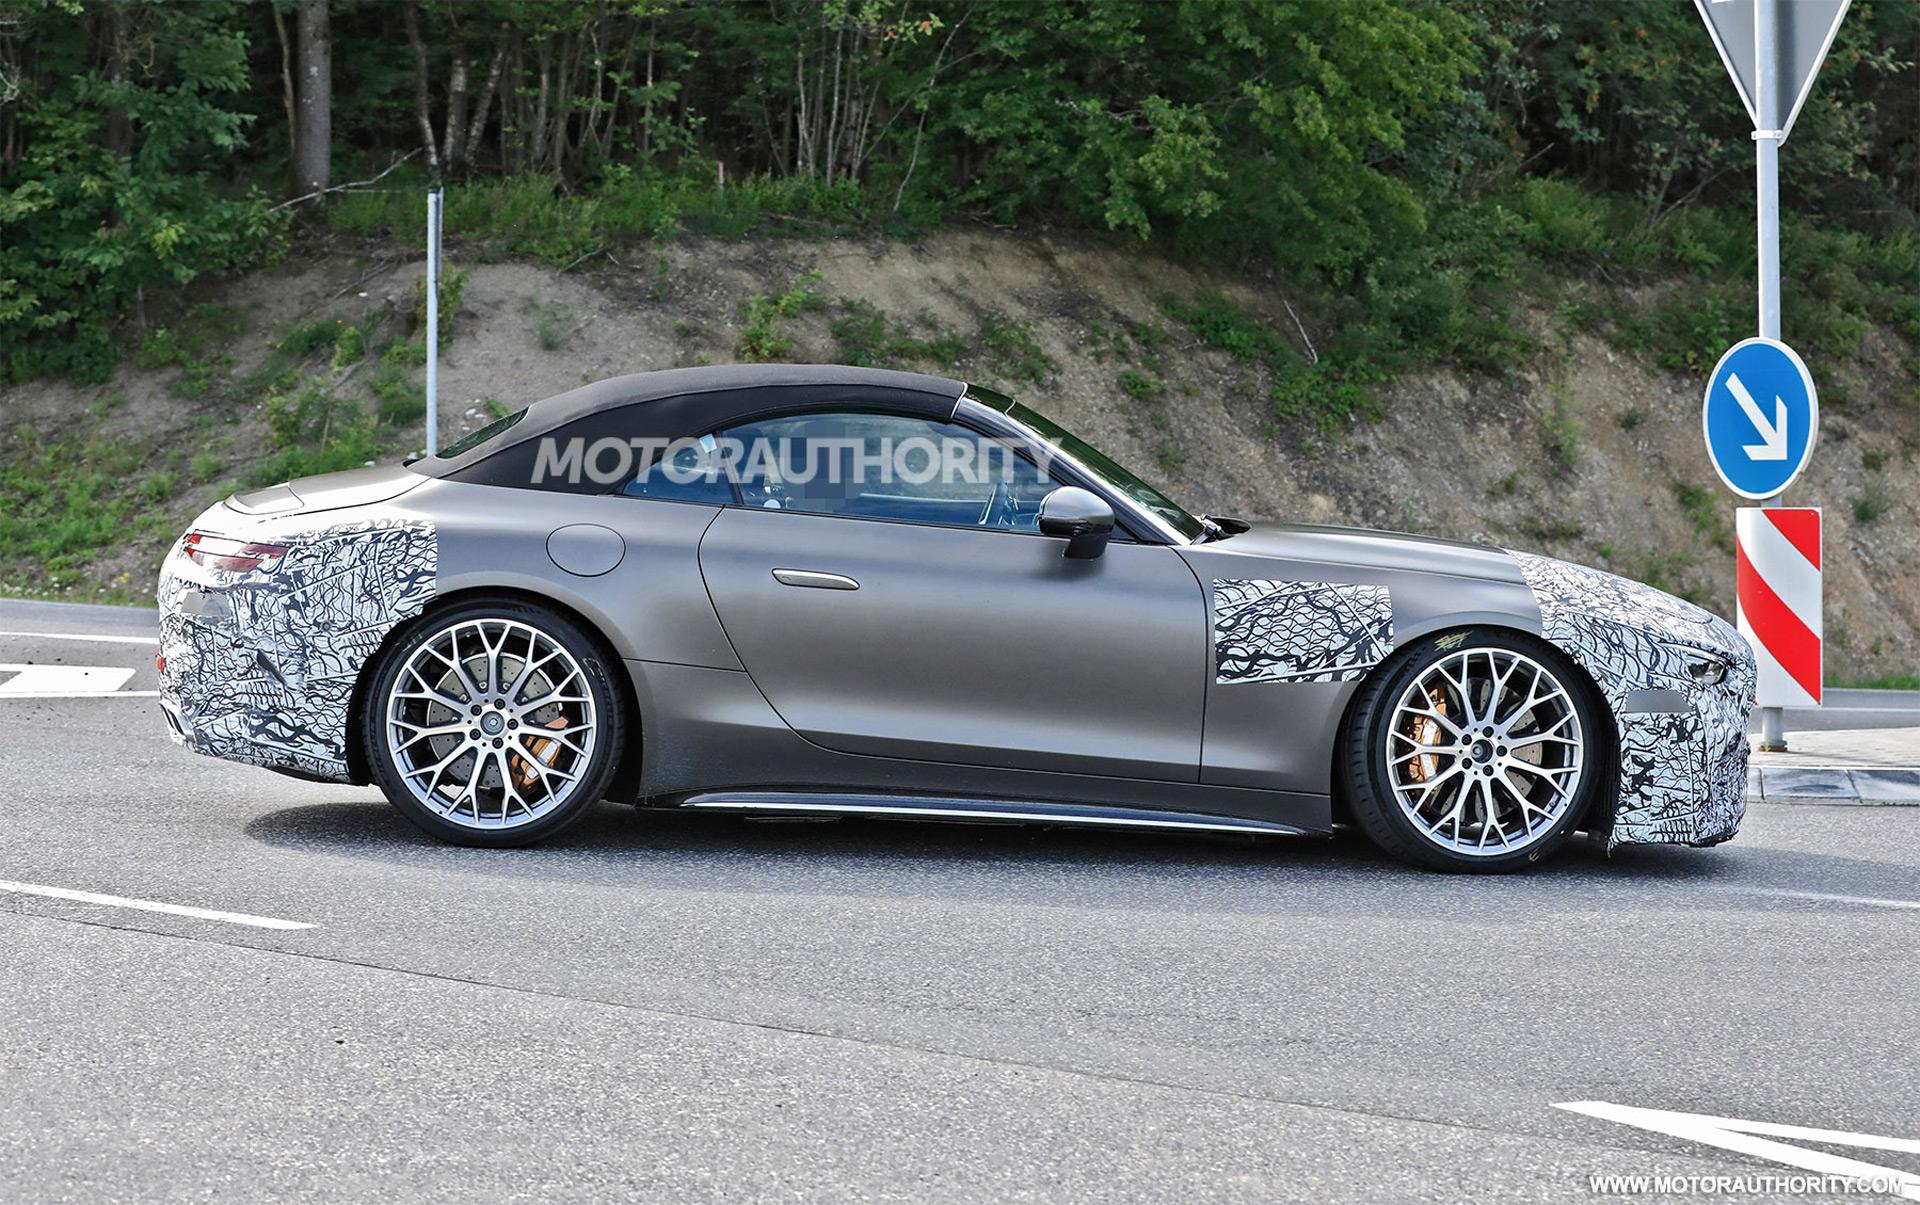 2022 Subaru WRX, 2022 Mercedes-Benz SL Roadster, McLaren 765LT Spider: Today's Car News